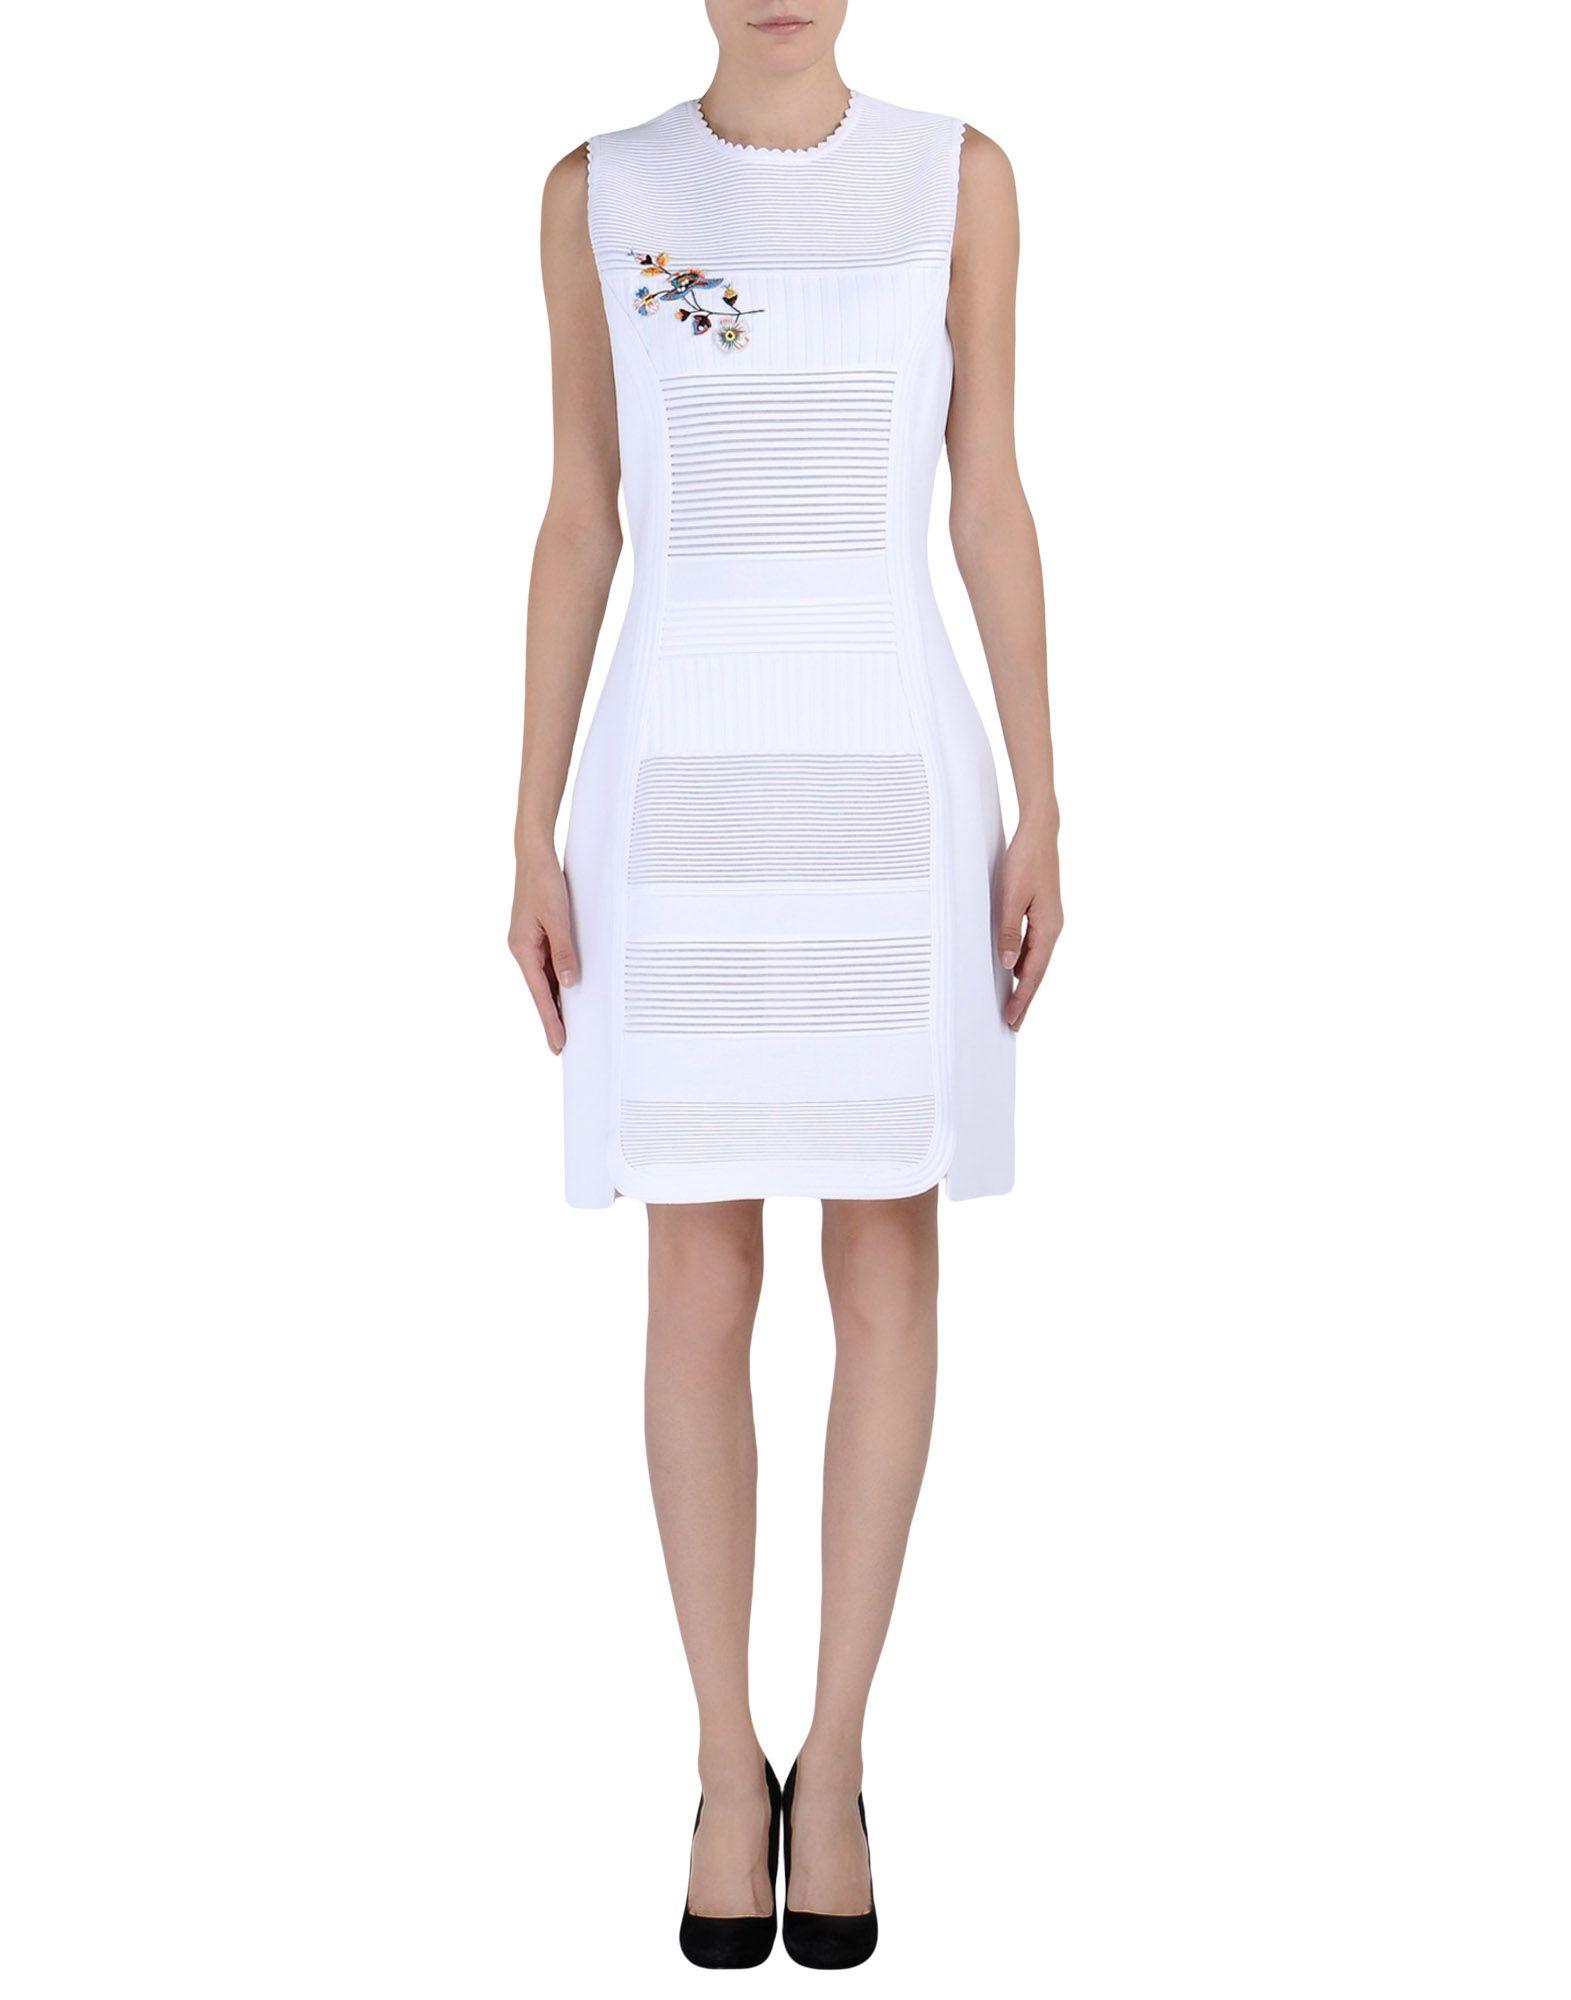 dior short dresses - photo #18